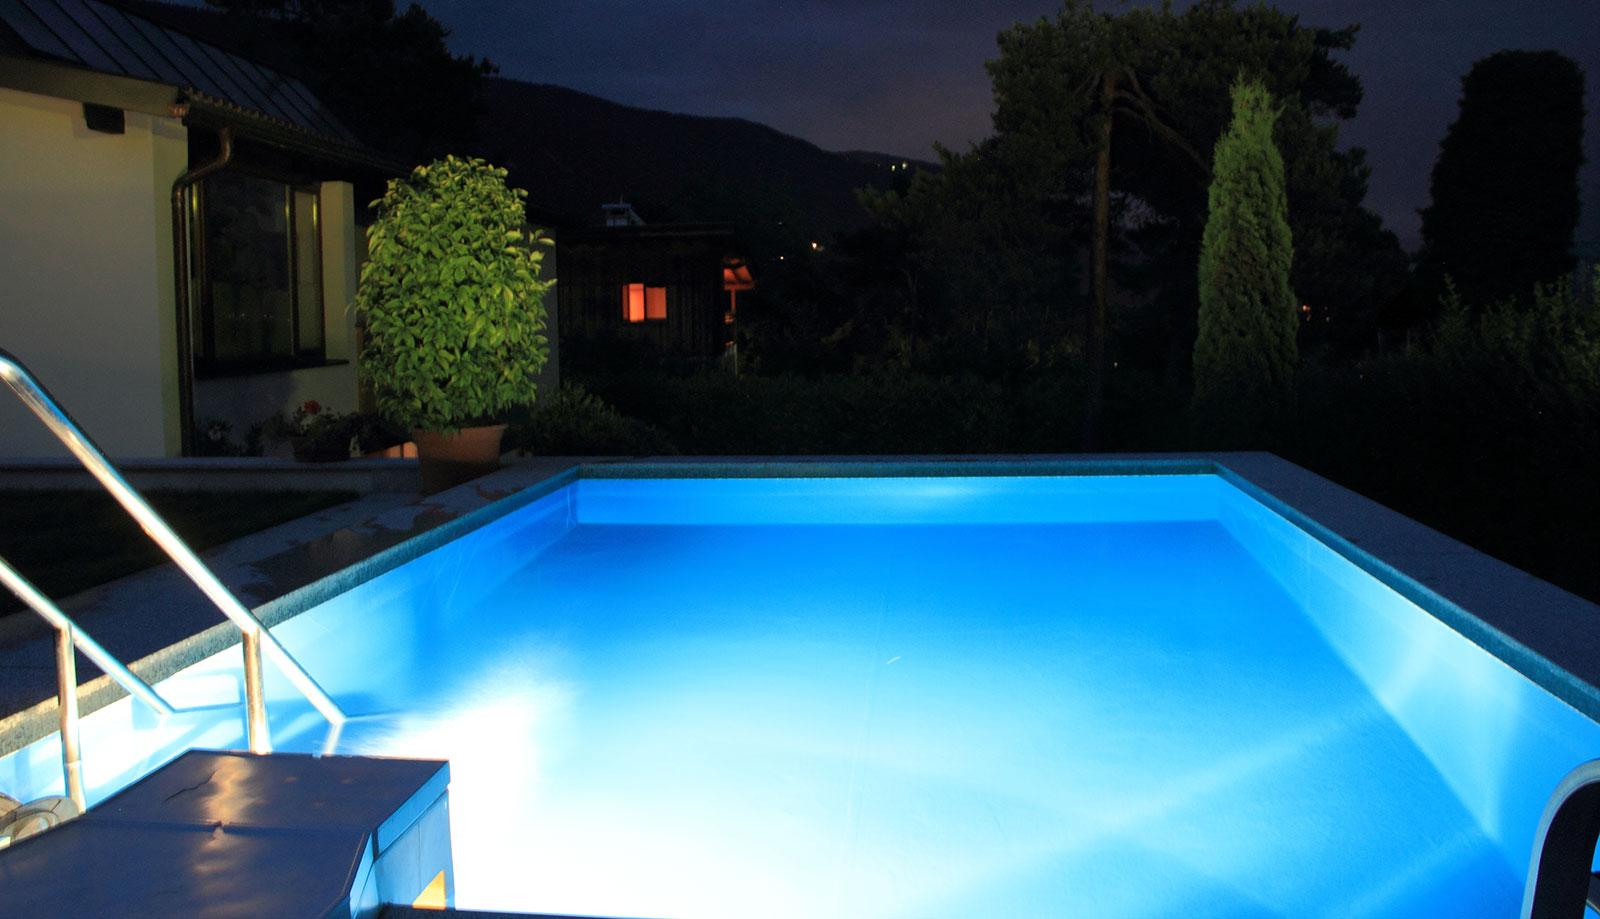 pool-nacht